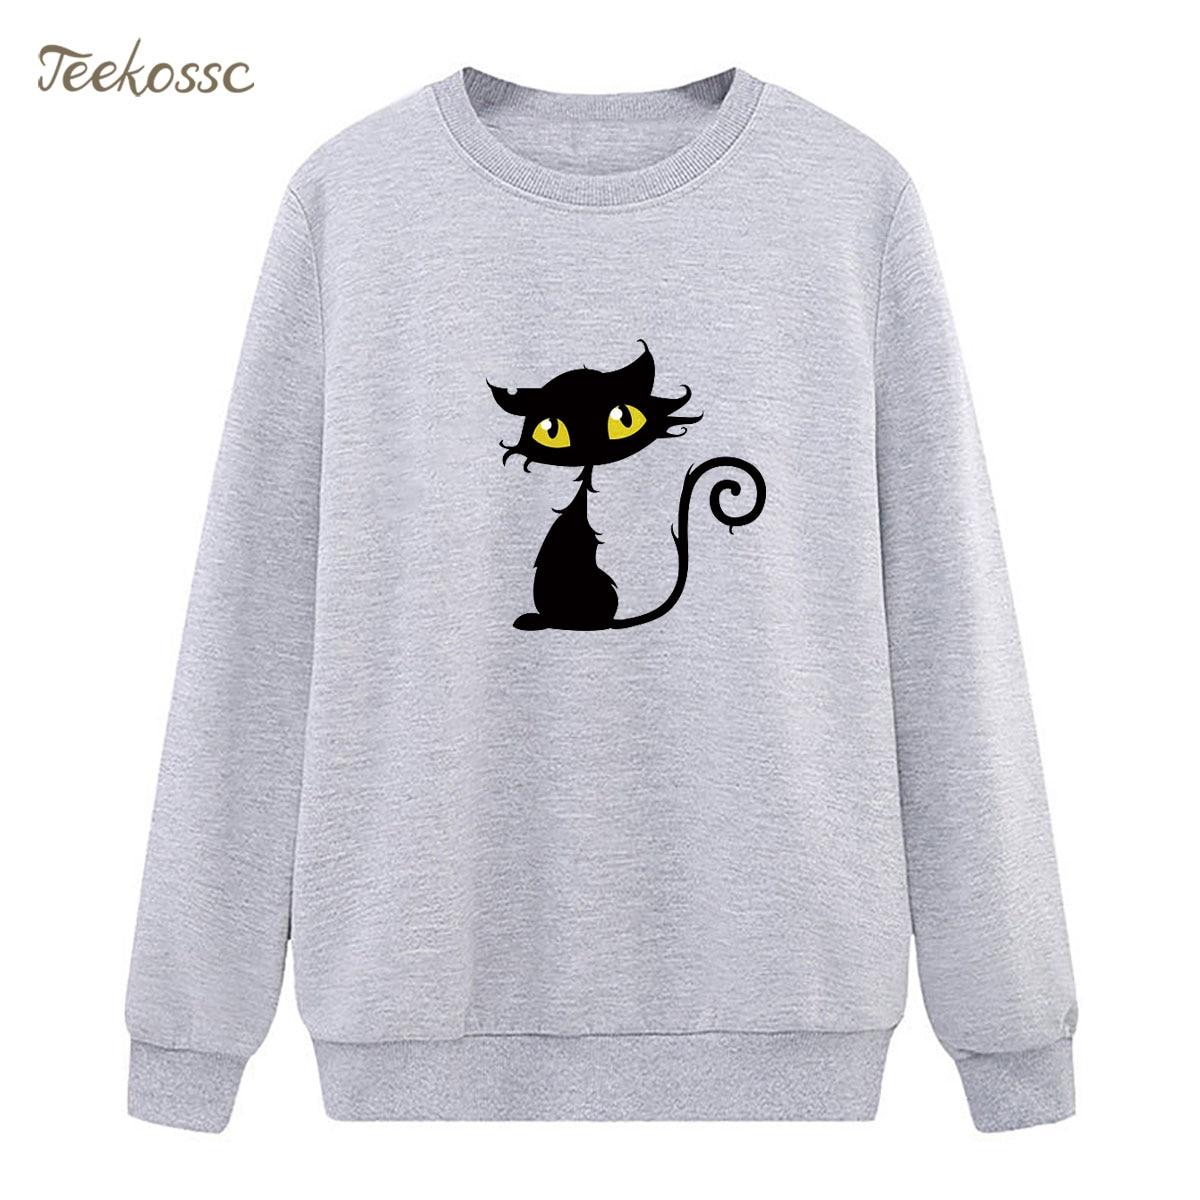 Cat Kawaii Sweatshirt Casual Hoodie Vogue Winter Autumn Women Lasdies Pullover Fleece Warm Loose Cute Streetwear Brand Clothing